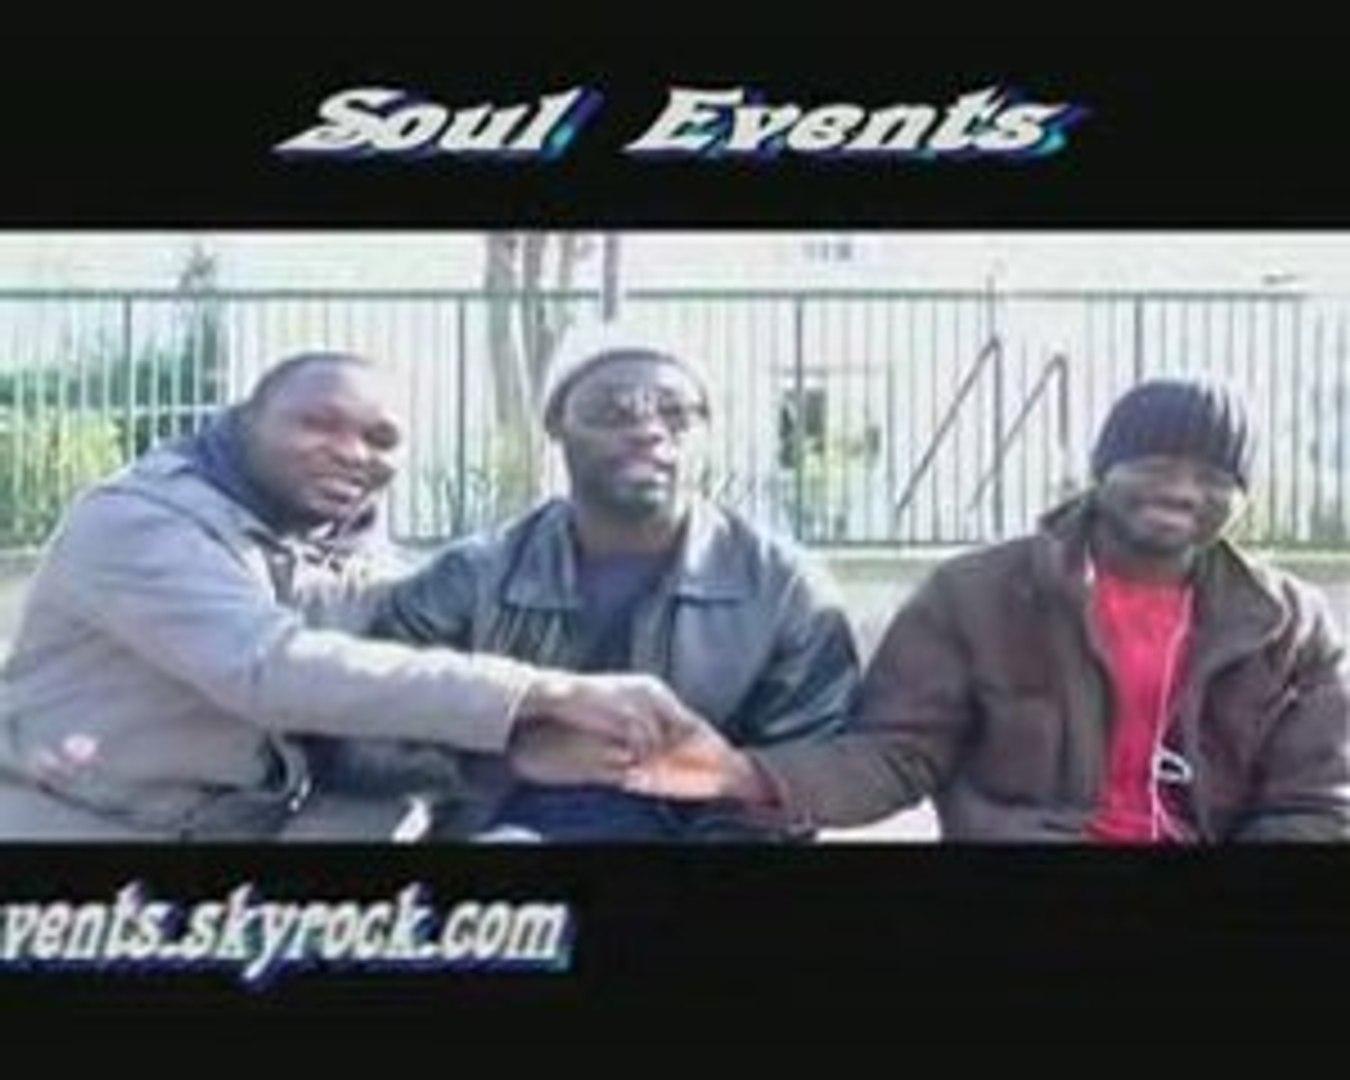 Soul events teaser.avi